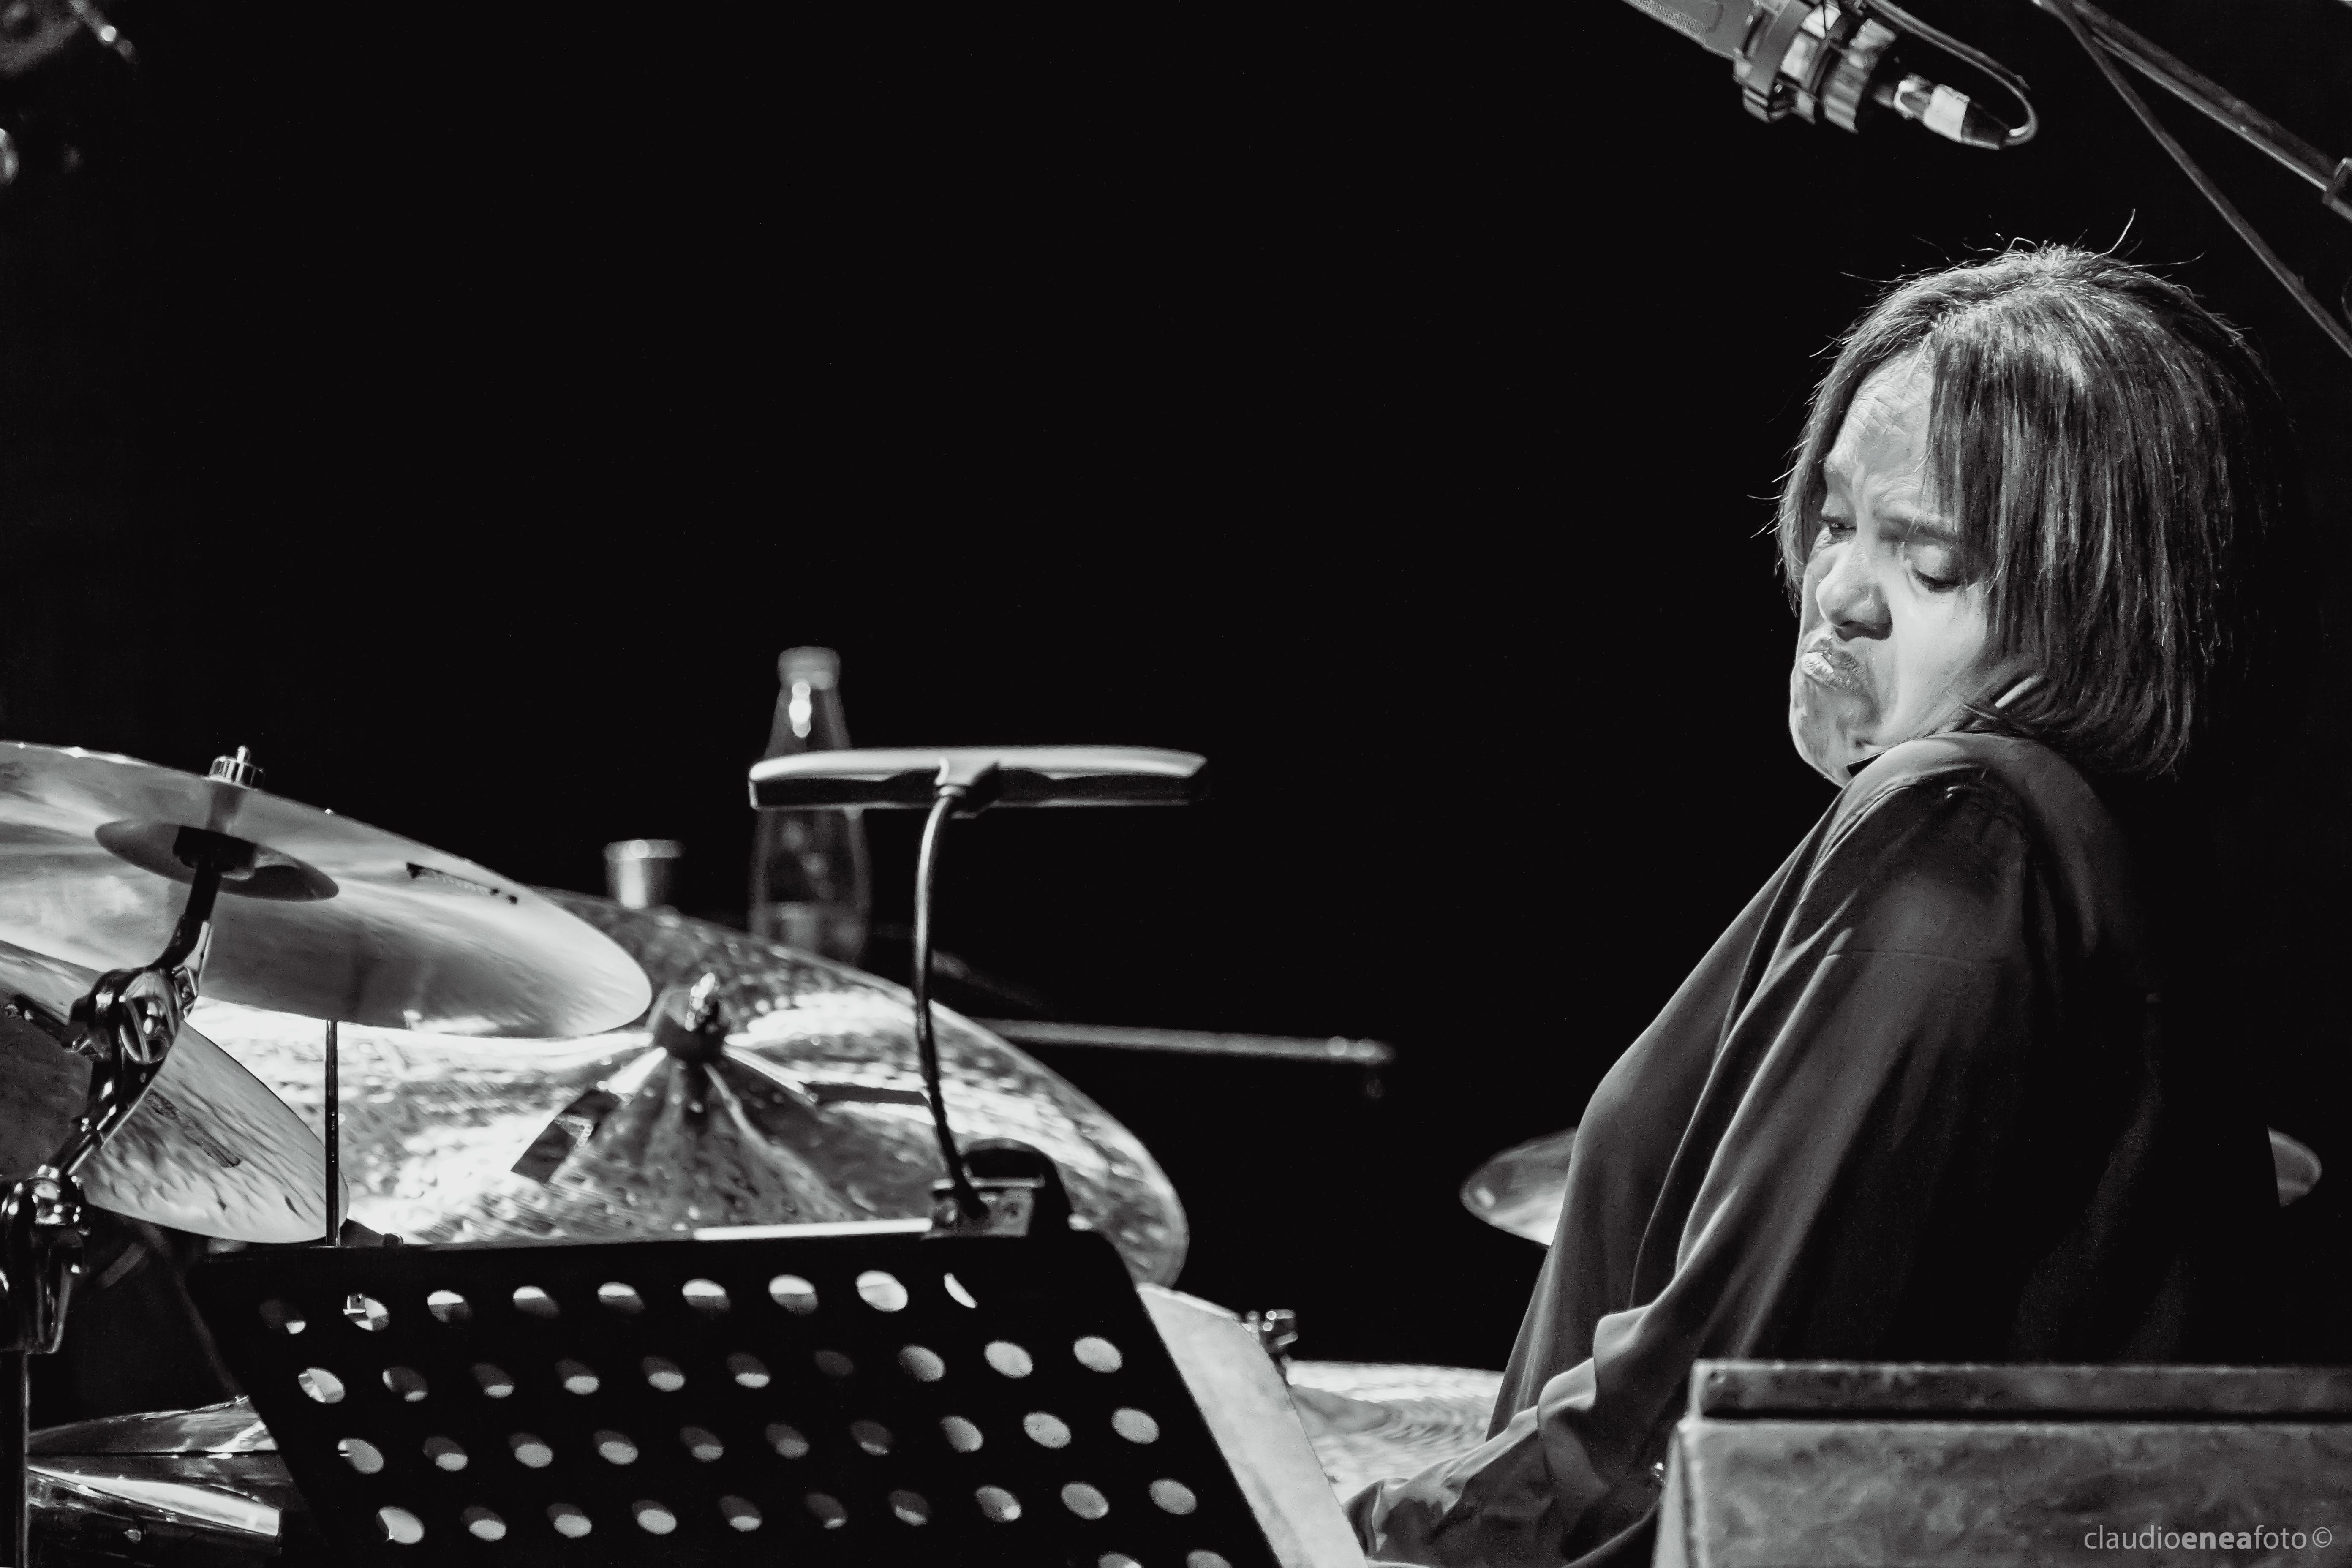 Danilo Pérez, John Patitucci e Terri Lyne Carrington - Children of the Light Roma 18.03.2019 Auditorium Parco della Musica